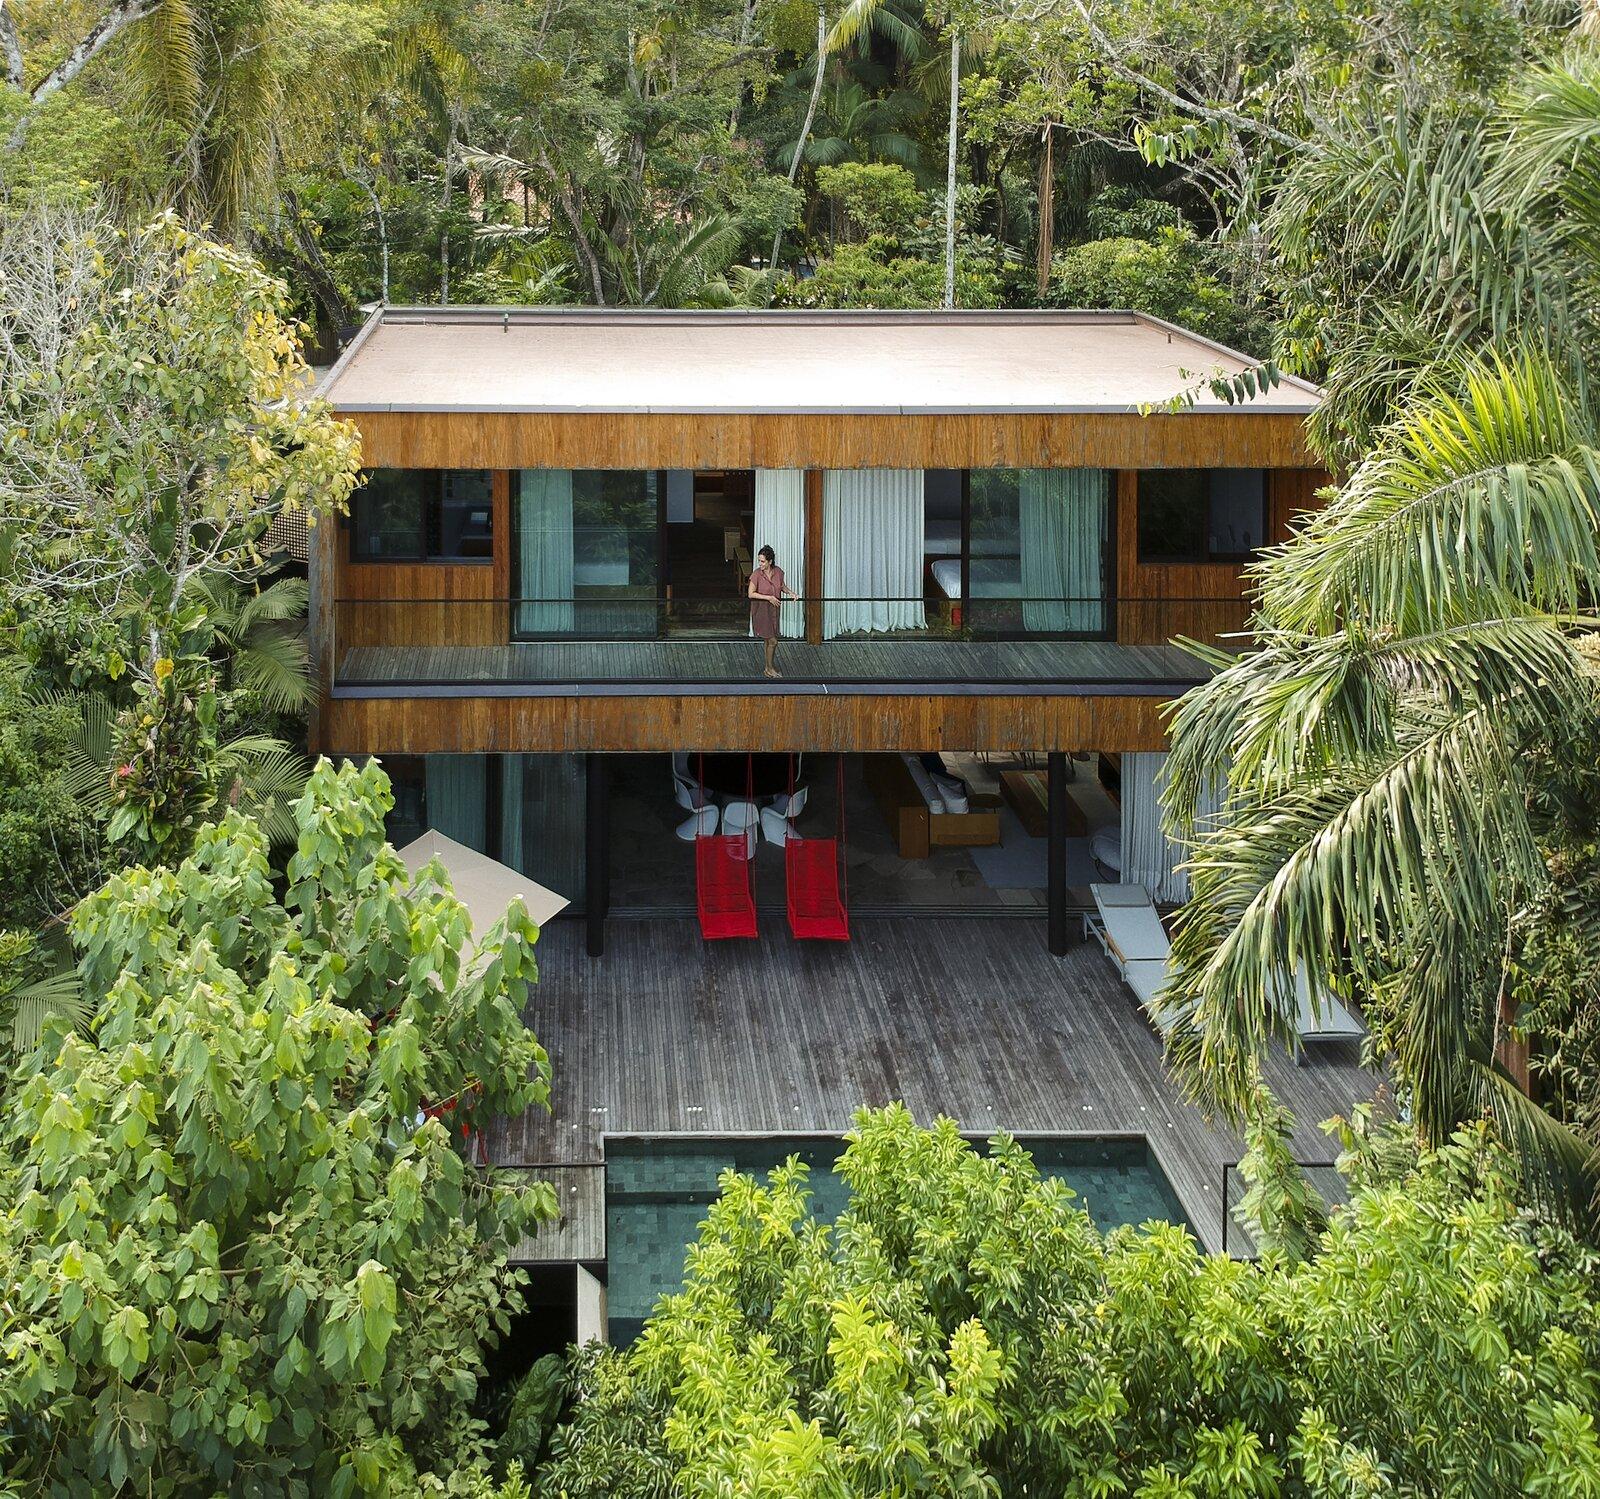 Exterior of Casa Iporanga by Daniel Fromer.